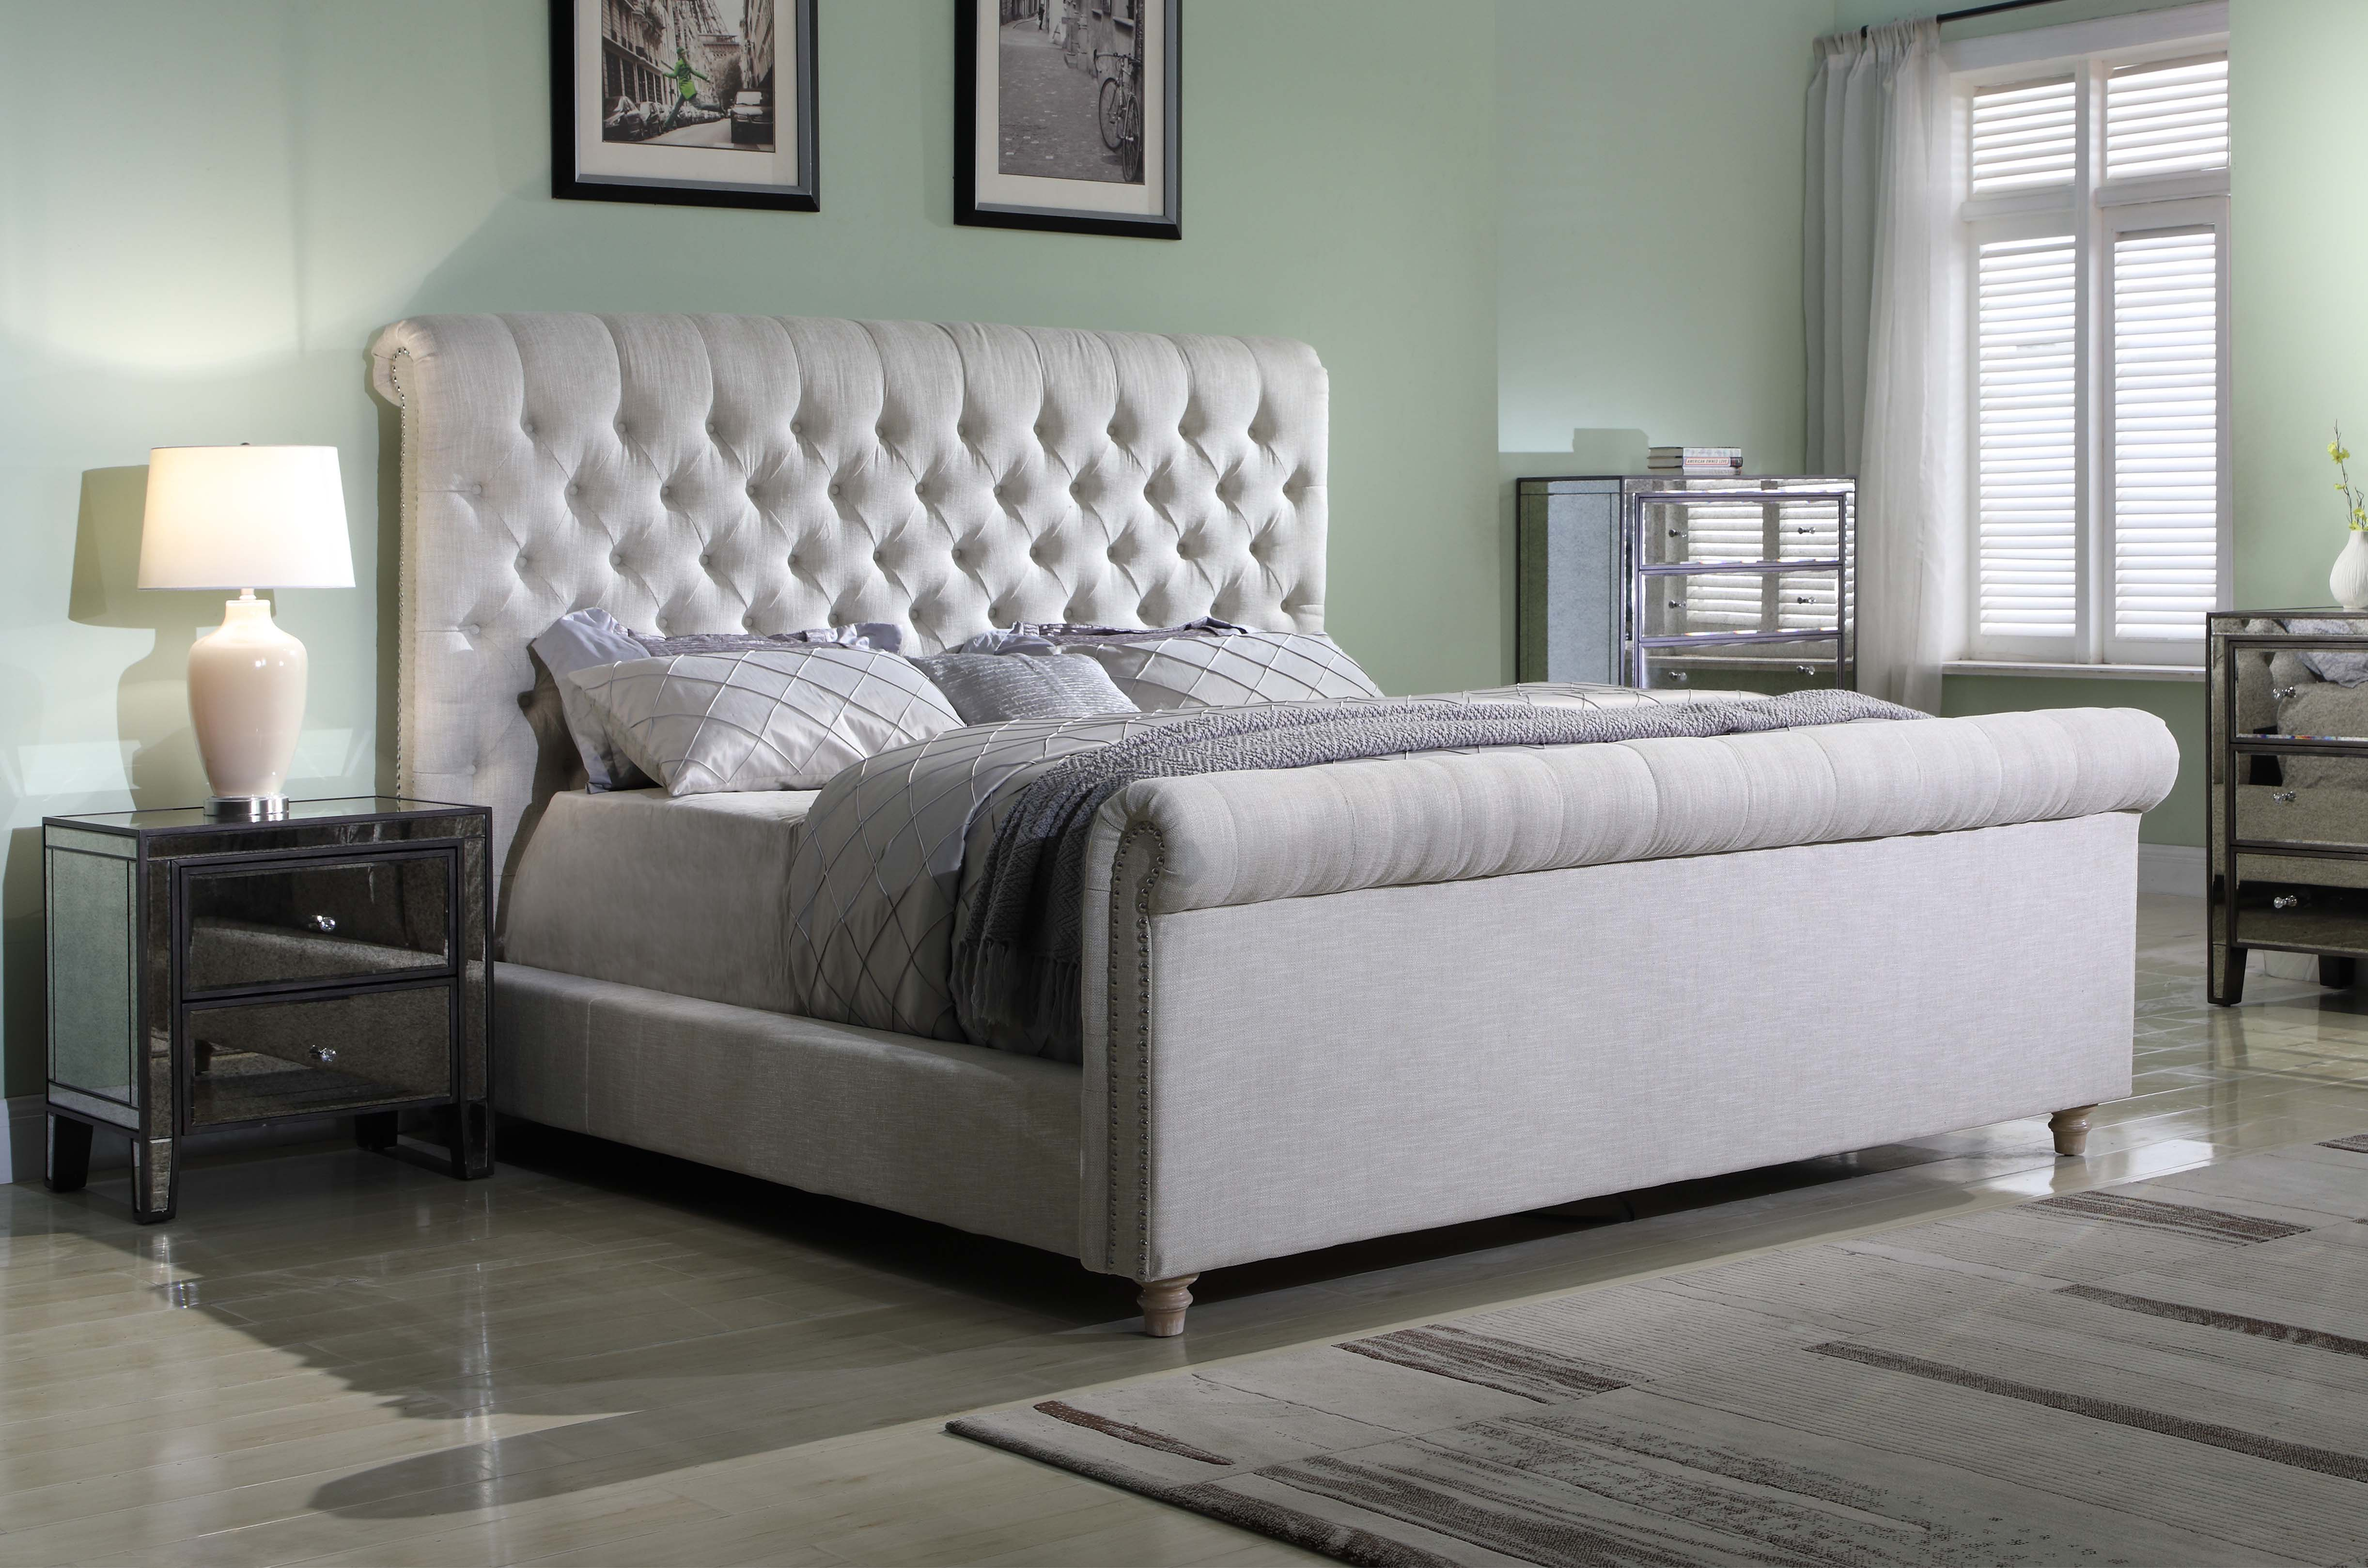 Best Master Furniture Jean Carrie Upholstered Sleigh Bed Eastern King Cream Fabric Walmart Com Walmart Com